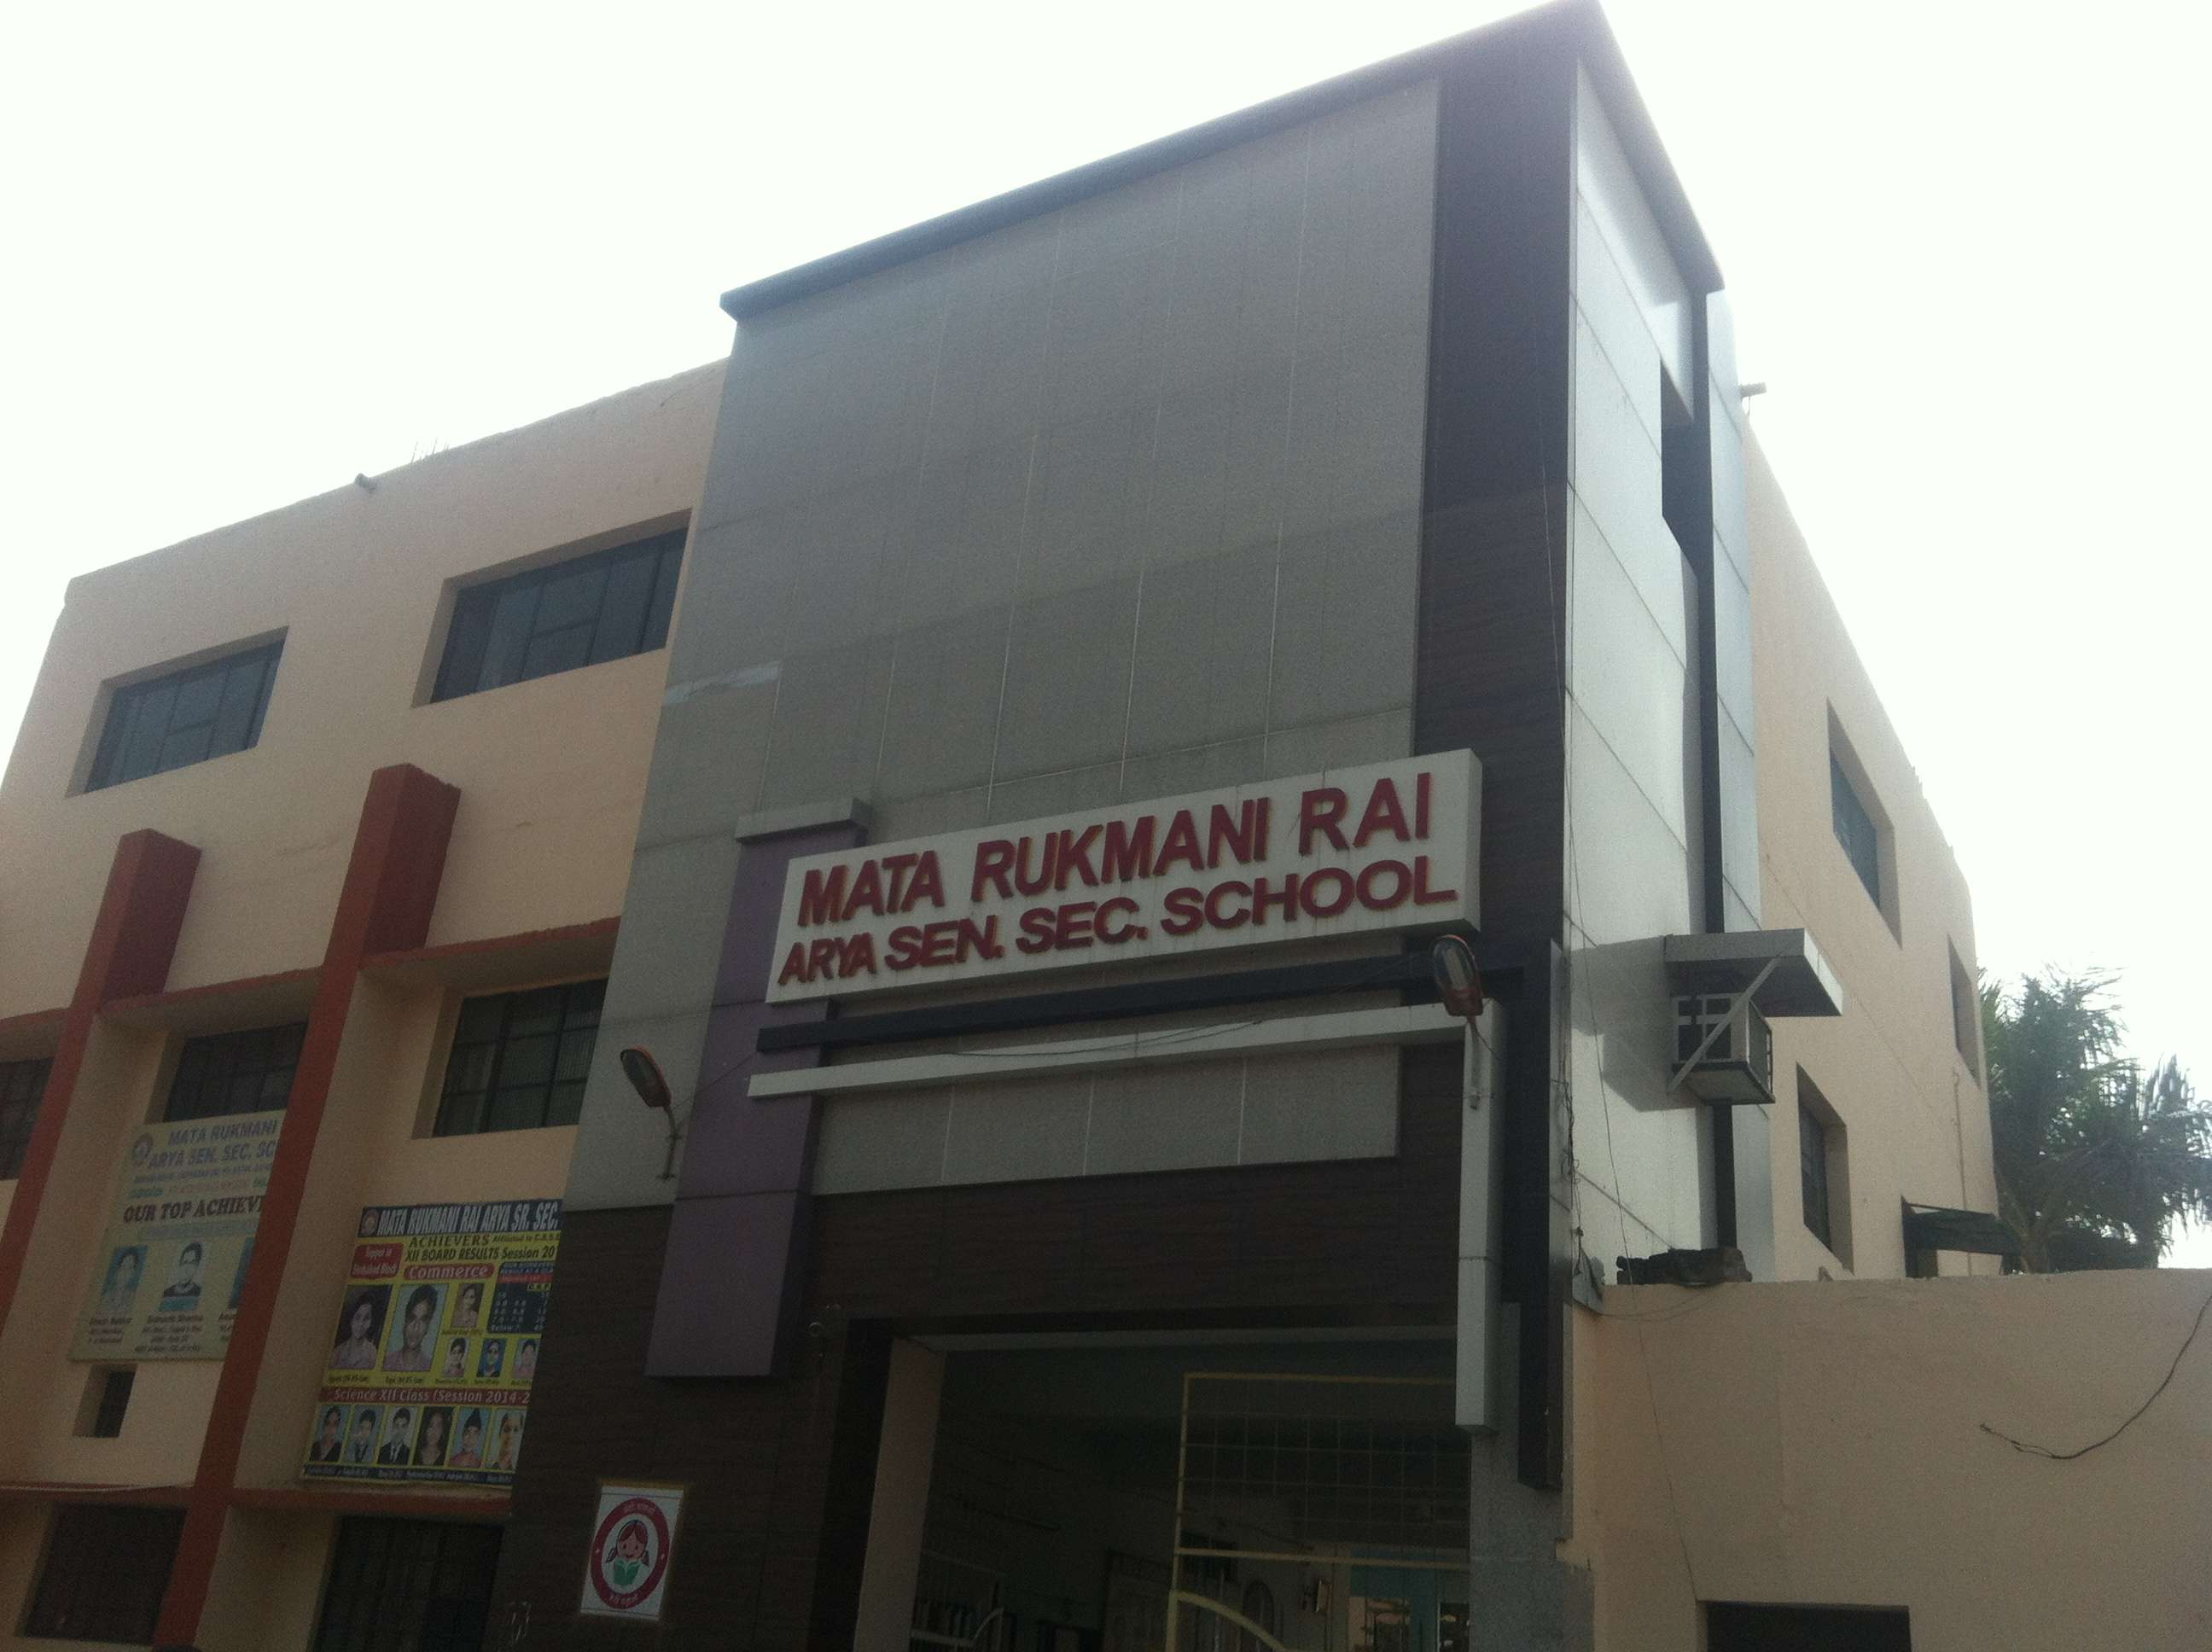 MATA RUKMANI RAI ARYA GIRLS SEC SCH BRARA ROAD SHAHABAD MARKANDA HARYANA KURUKSHETRA HARYANA 530278